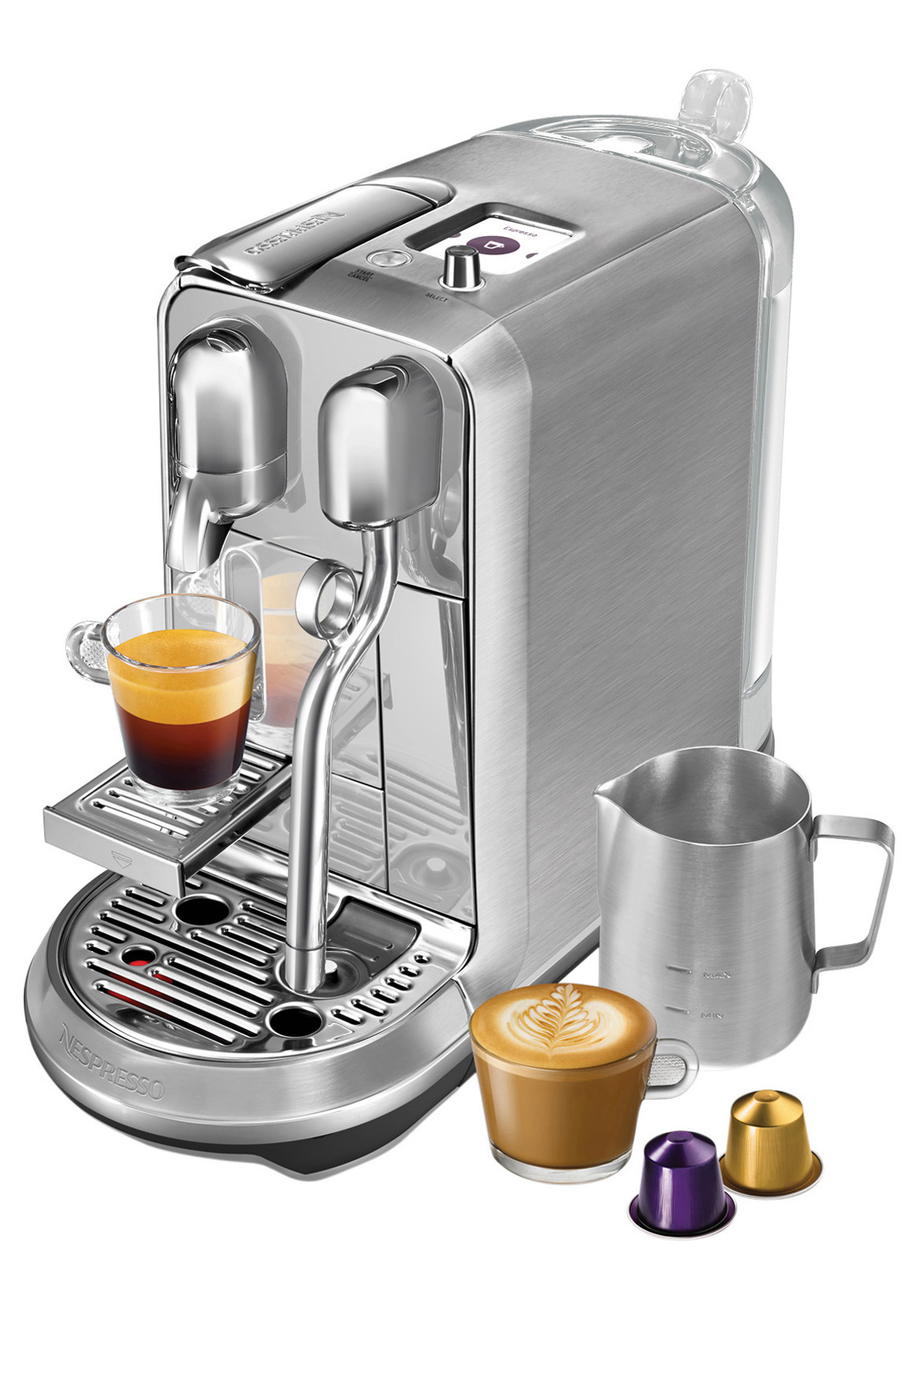 Breville Nespresso Creatista Plus Bne800 Reviews